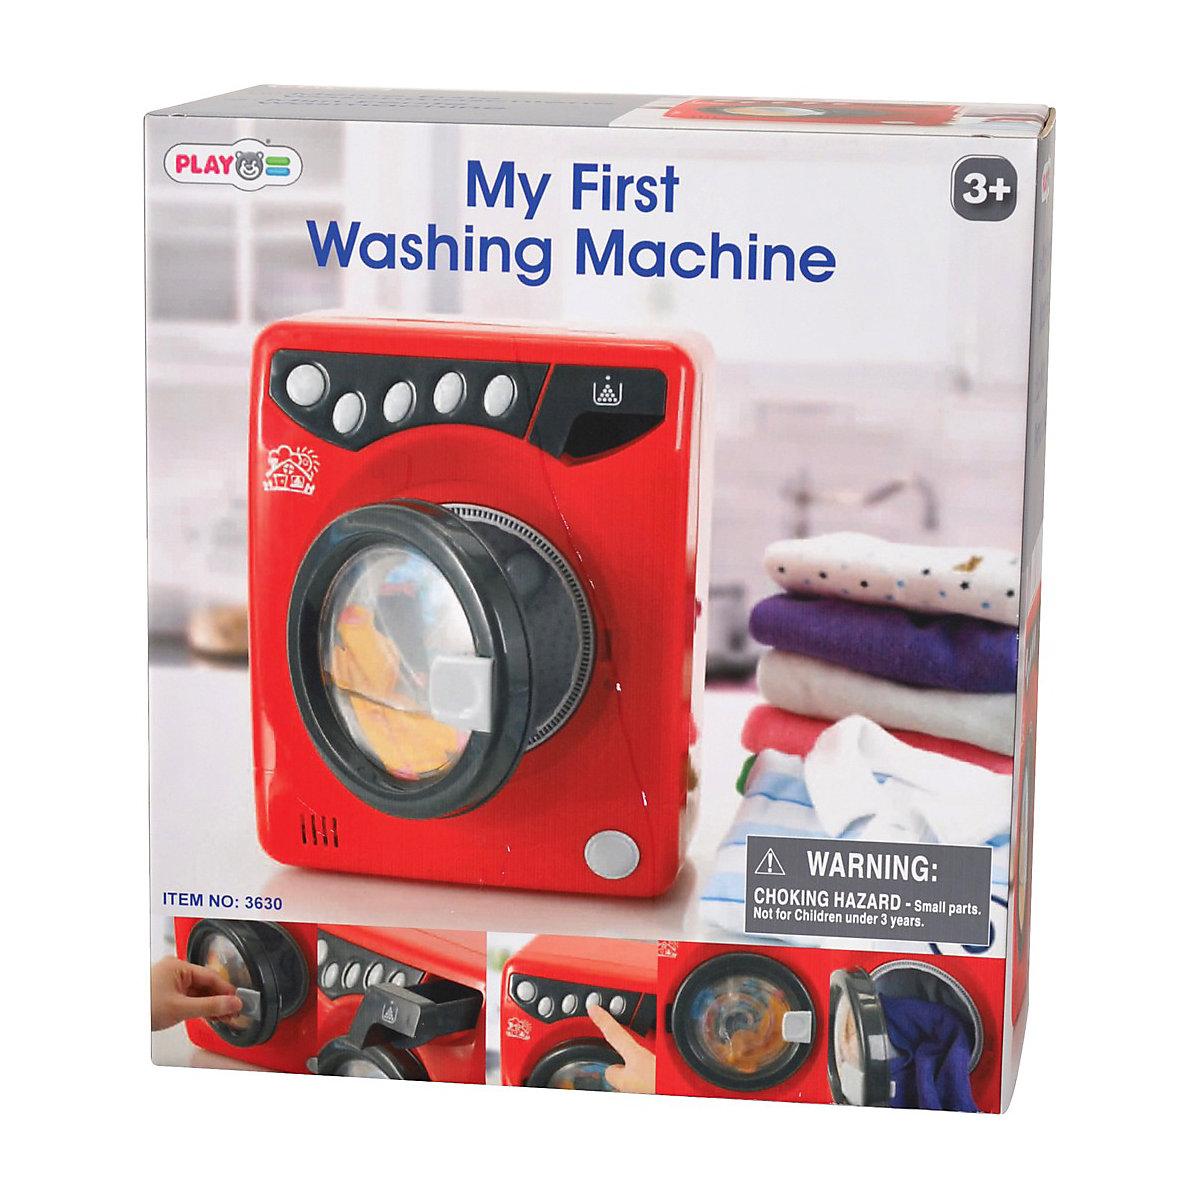 meine erste waschmaschine rot schwarz haushaltsger t playgo mytoys. Black Bedroom Furniture Sets. Home Design Ideas